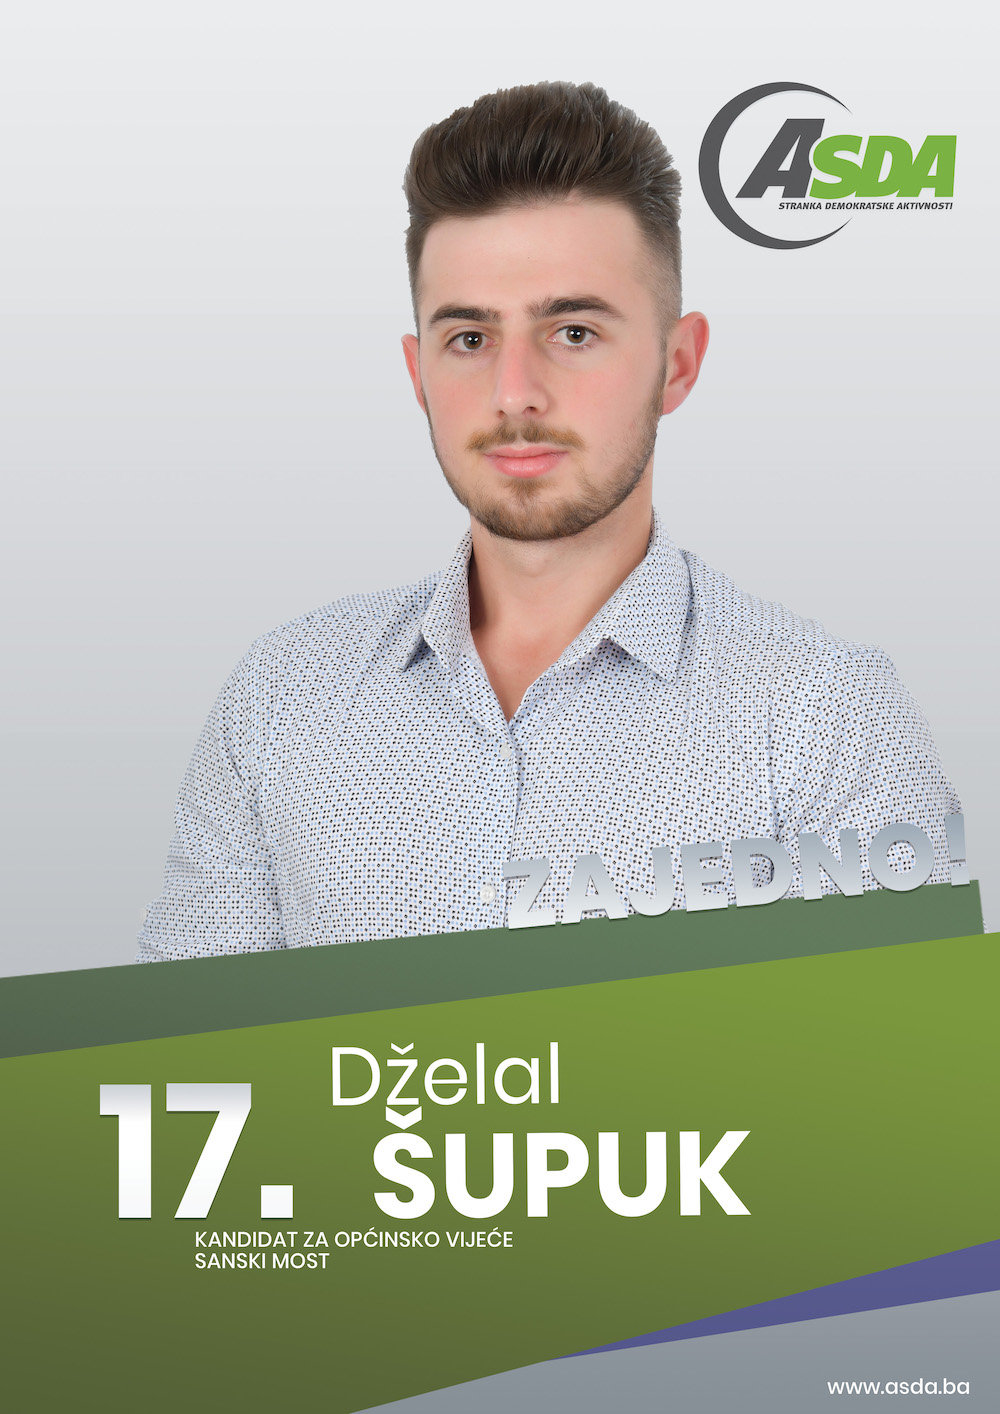 Dželal Šupuk